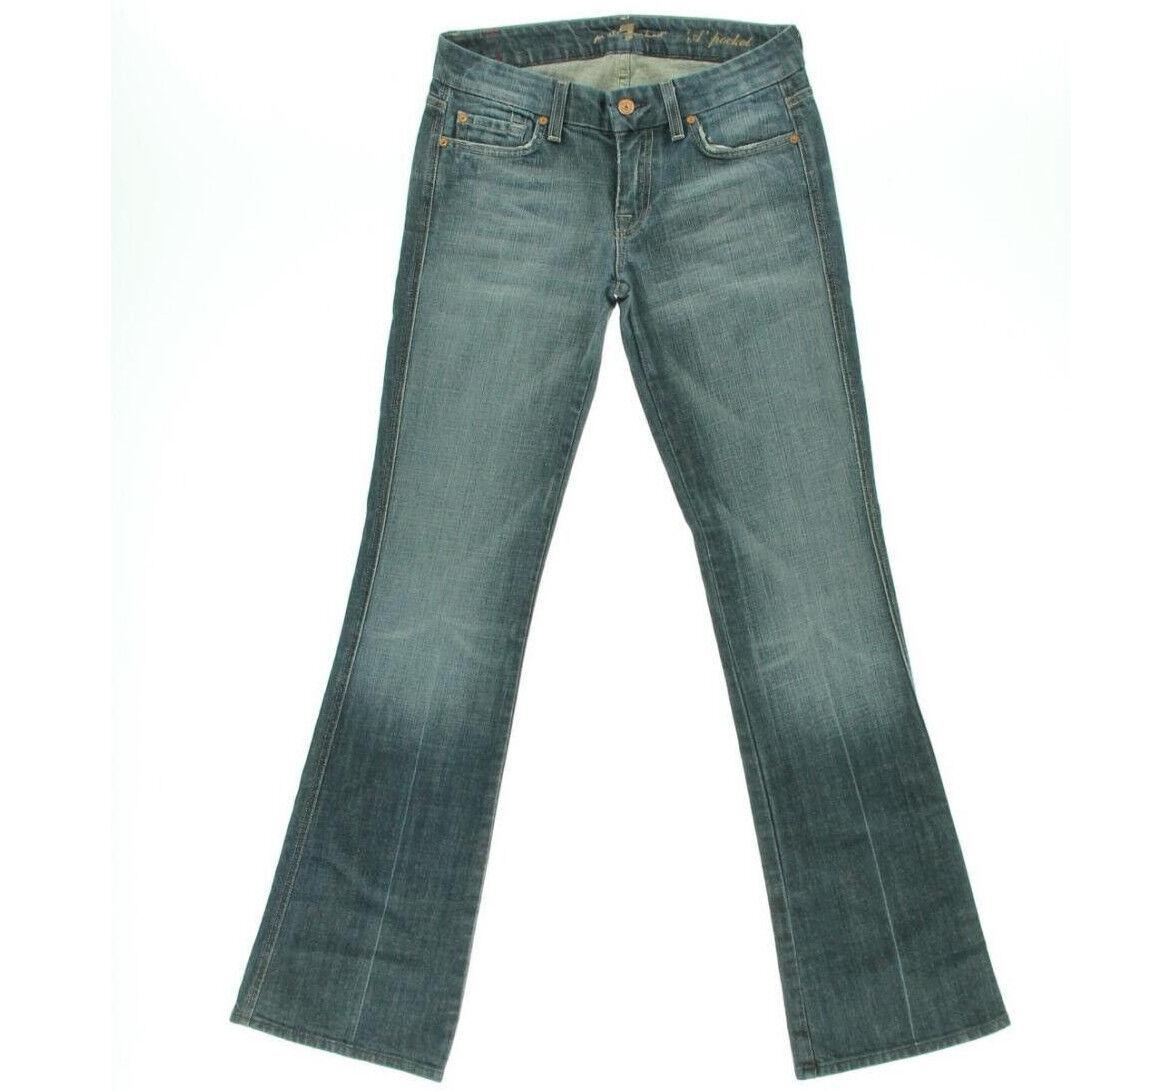 7 For All Mankind Jeans Denim Mid-Rise Flare Whisker Wash W24 L32 AU6 EUC damen